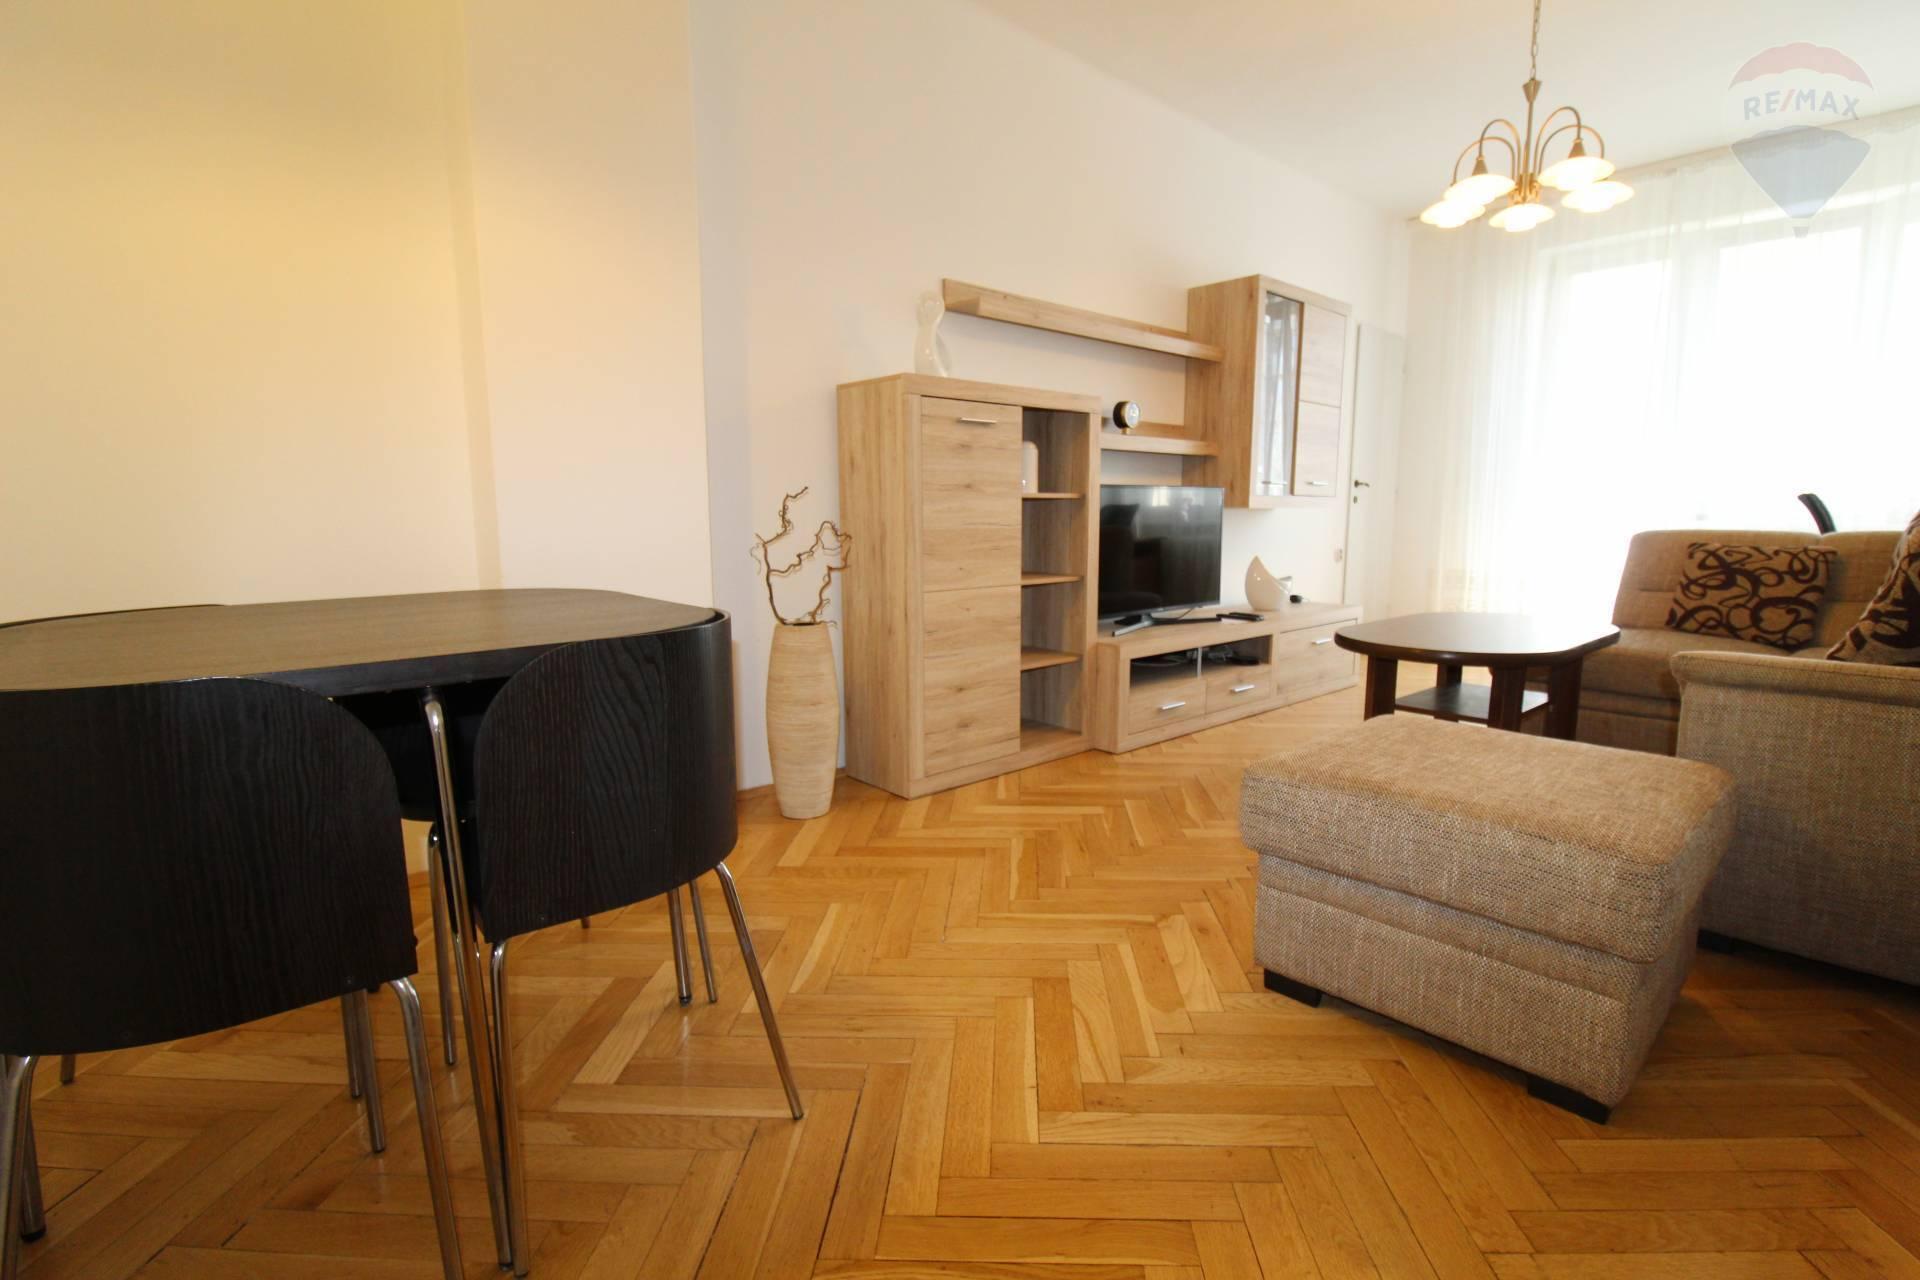 Predaj bytu (3 izbový) 65 m2, Bratislava - Ružinov -